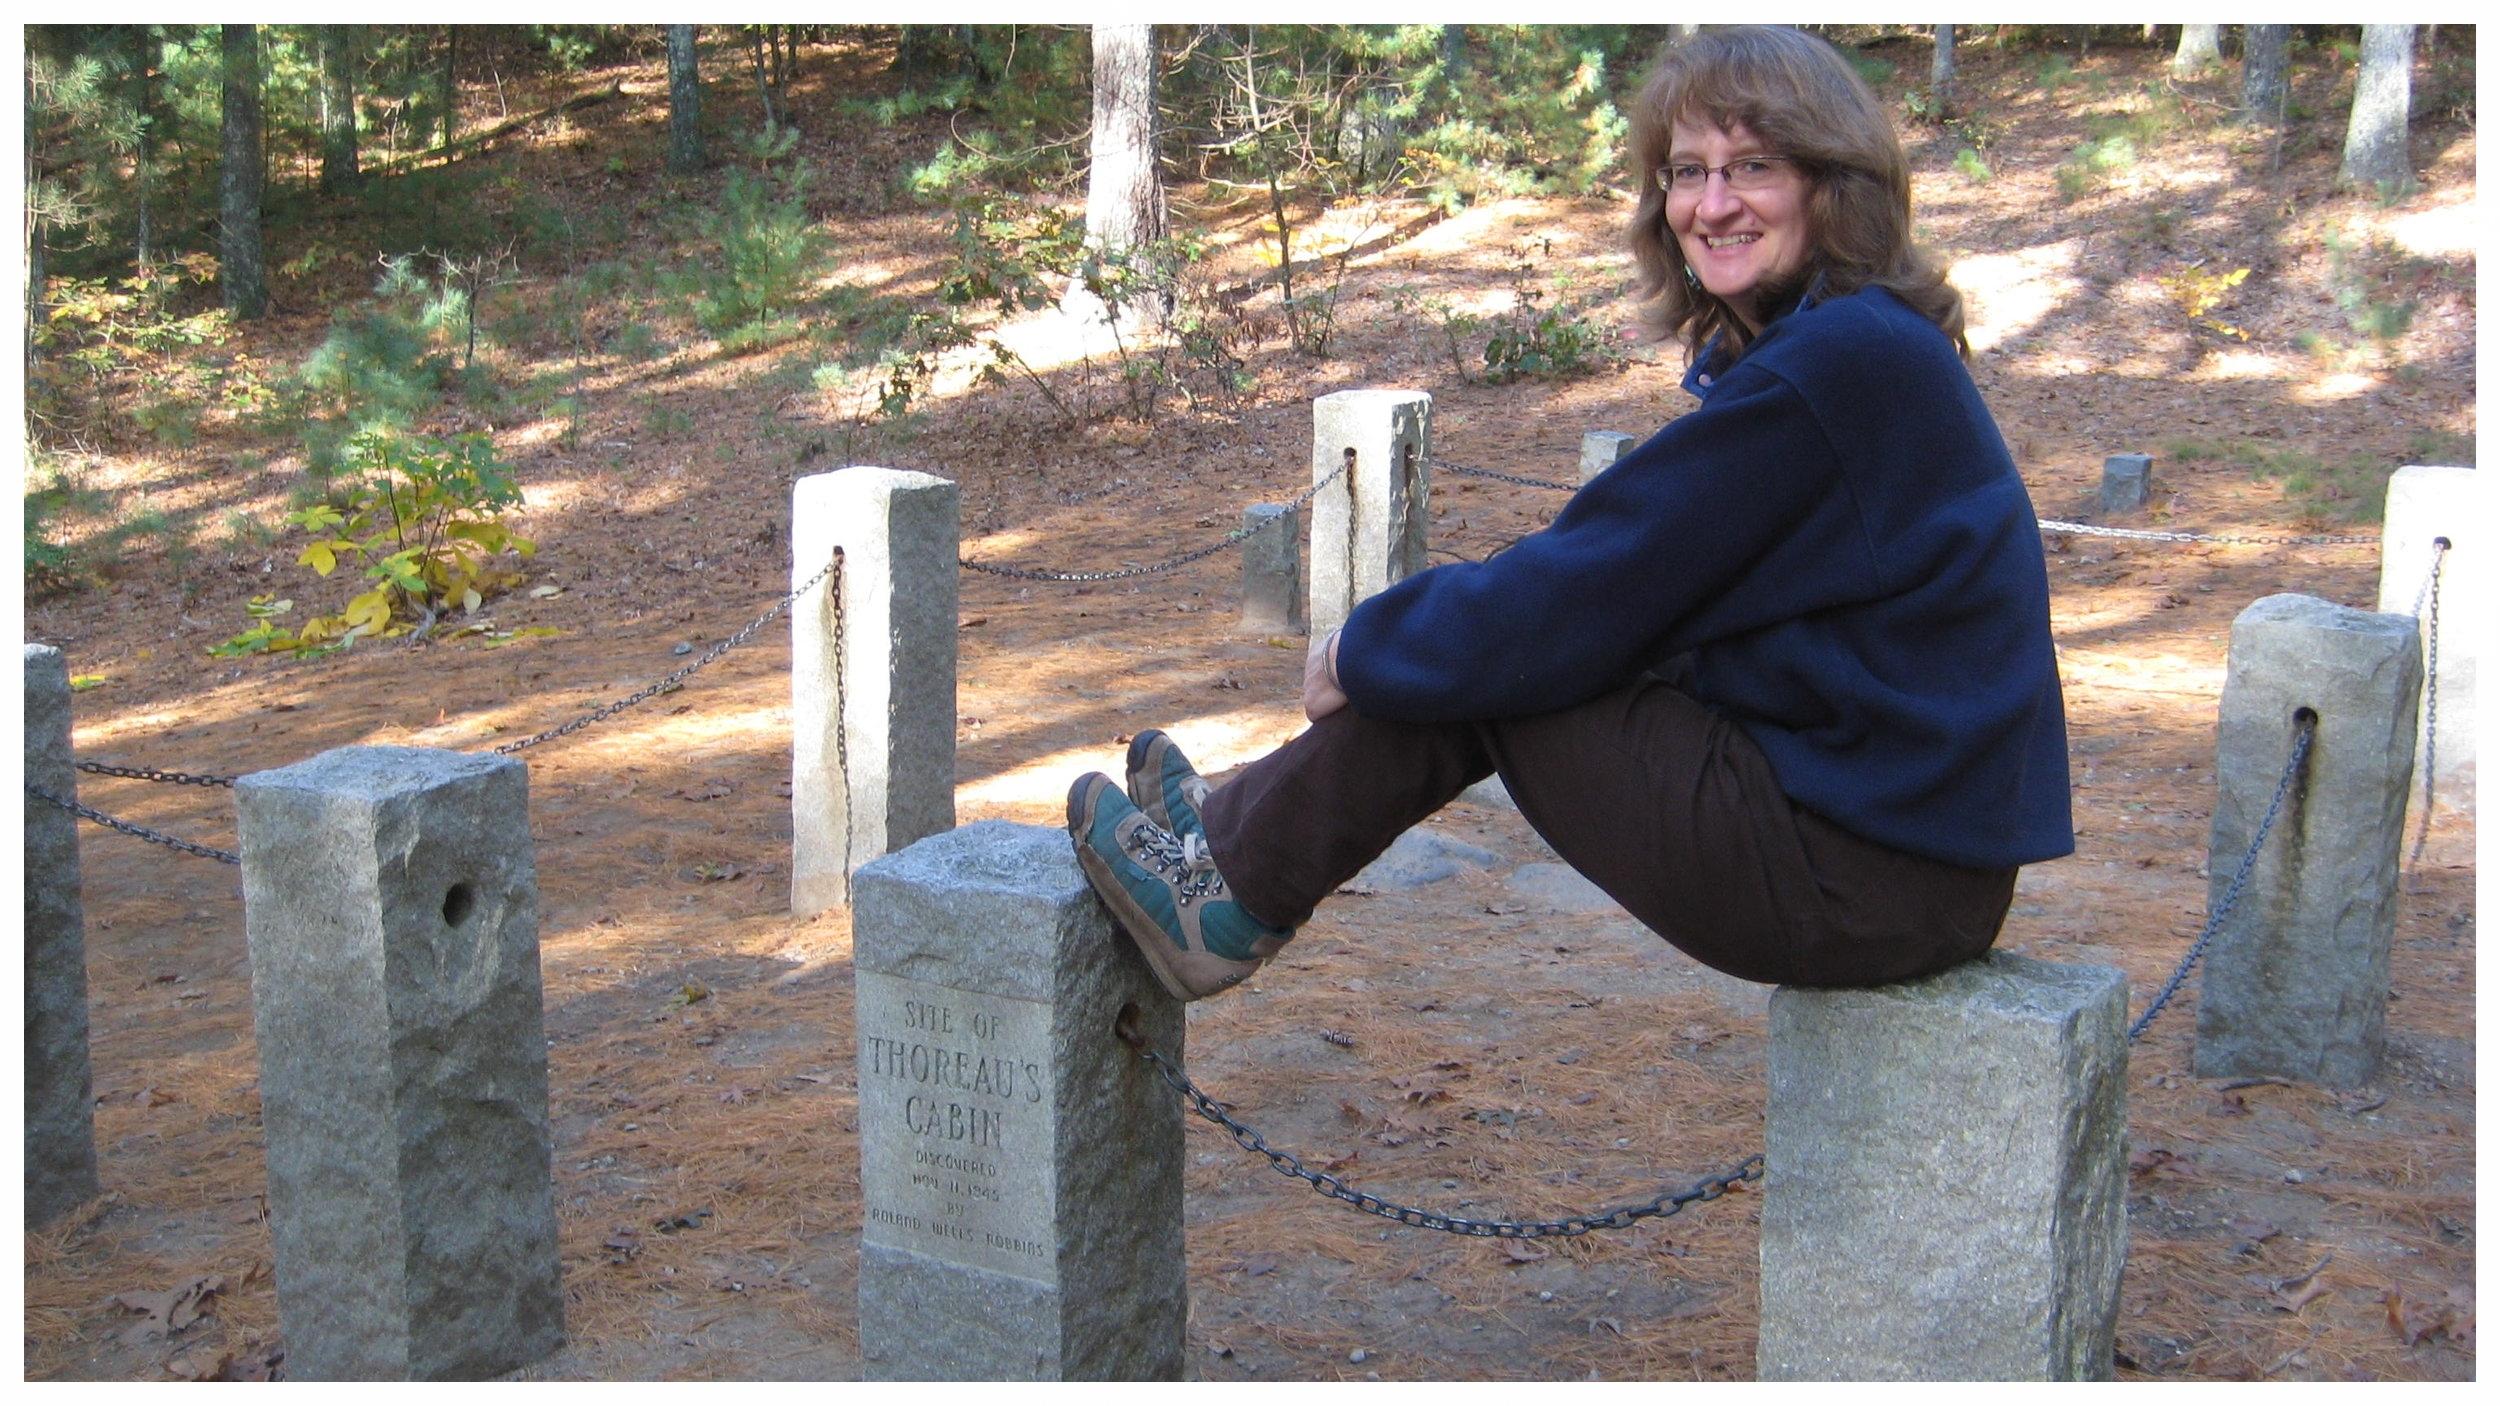 Thoreau's cabin site 2.JPG